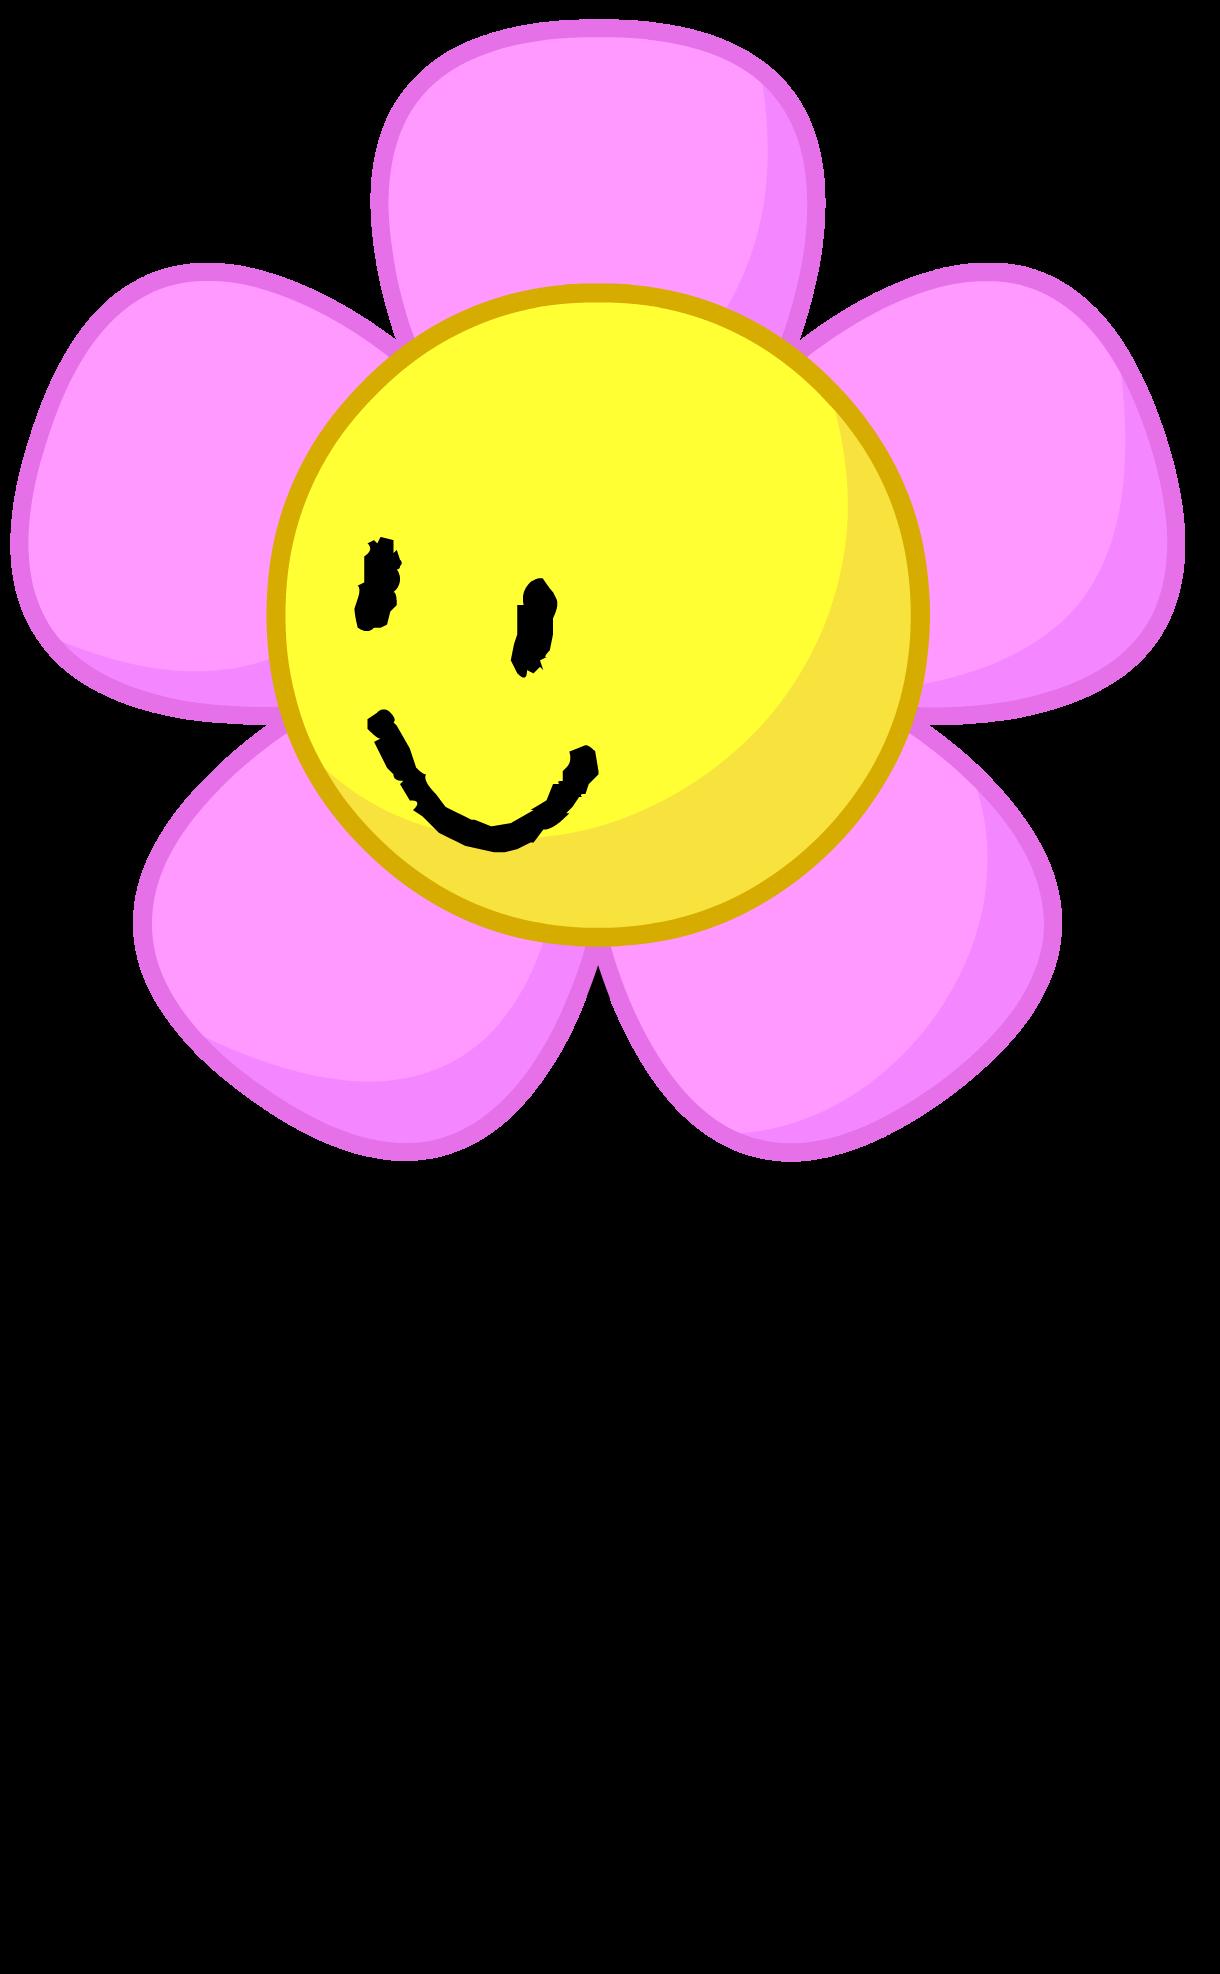 Flower | Battle for Dream Island Wiki | FANDOM powered by Wikia